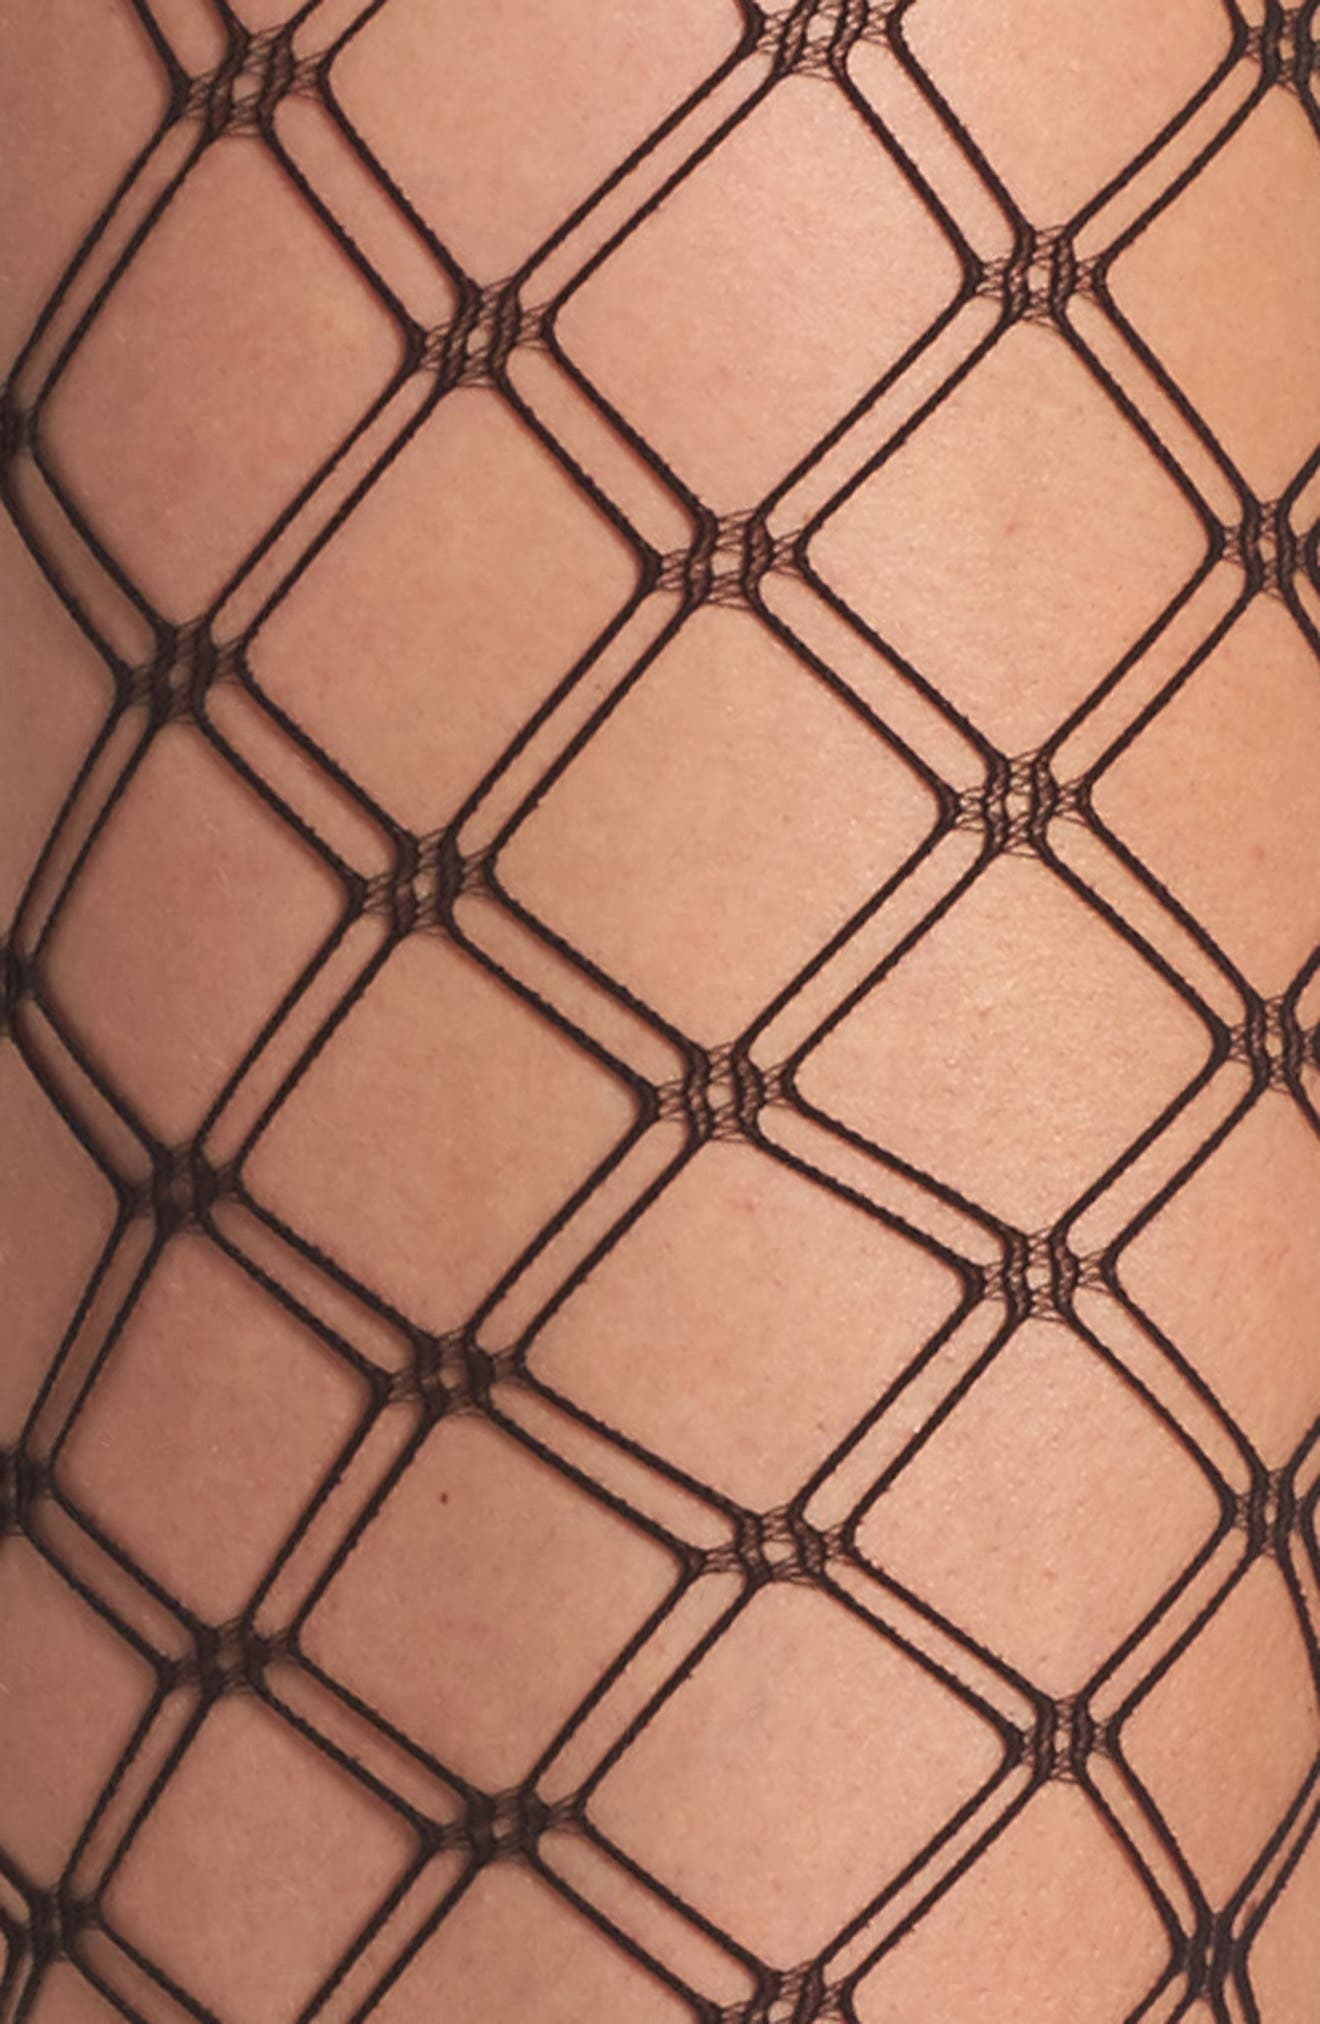 Double Diamond Fishnet Tights,                             Alternate thumbnail 2, color,                             001